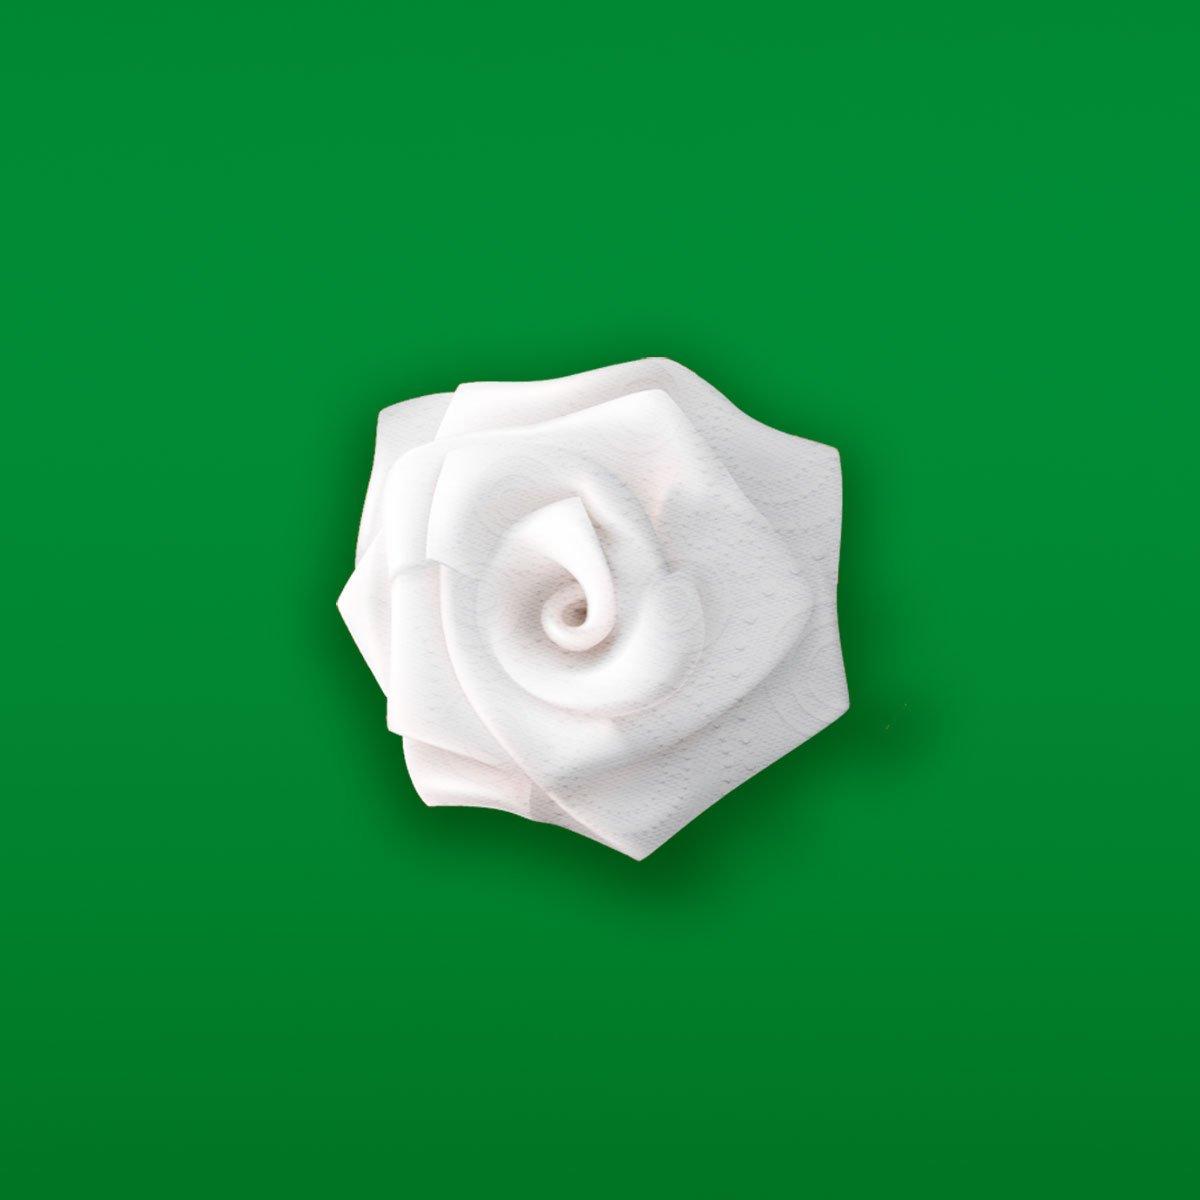 Origami Paper Circuits - learn.sparkfun.com   1200x1200